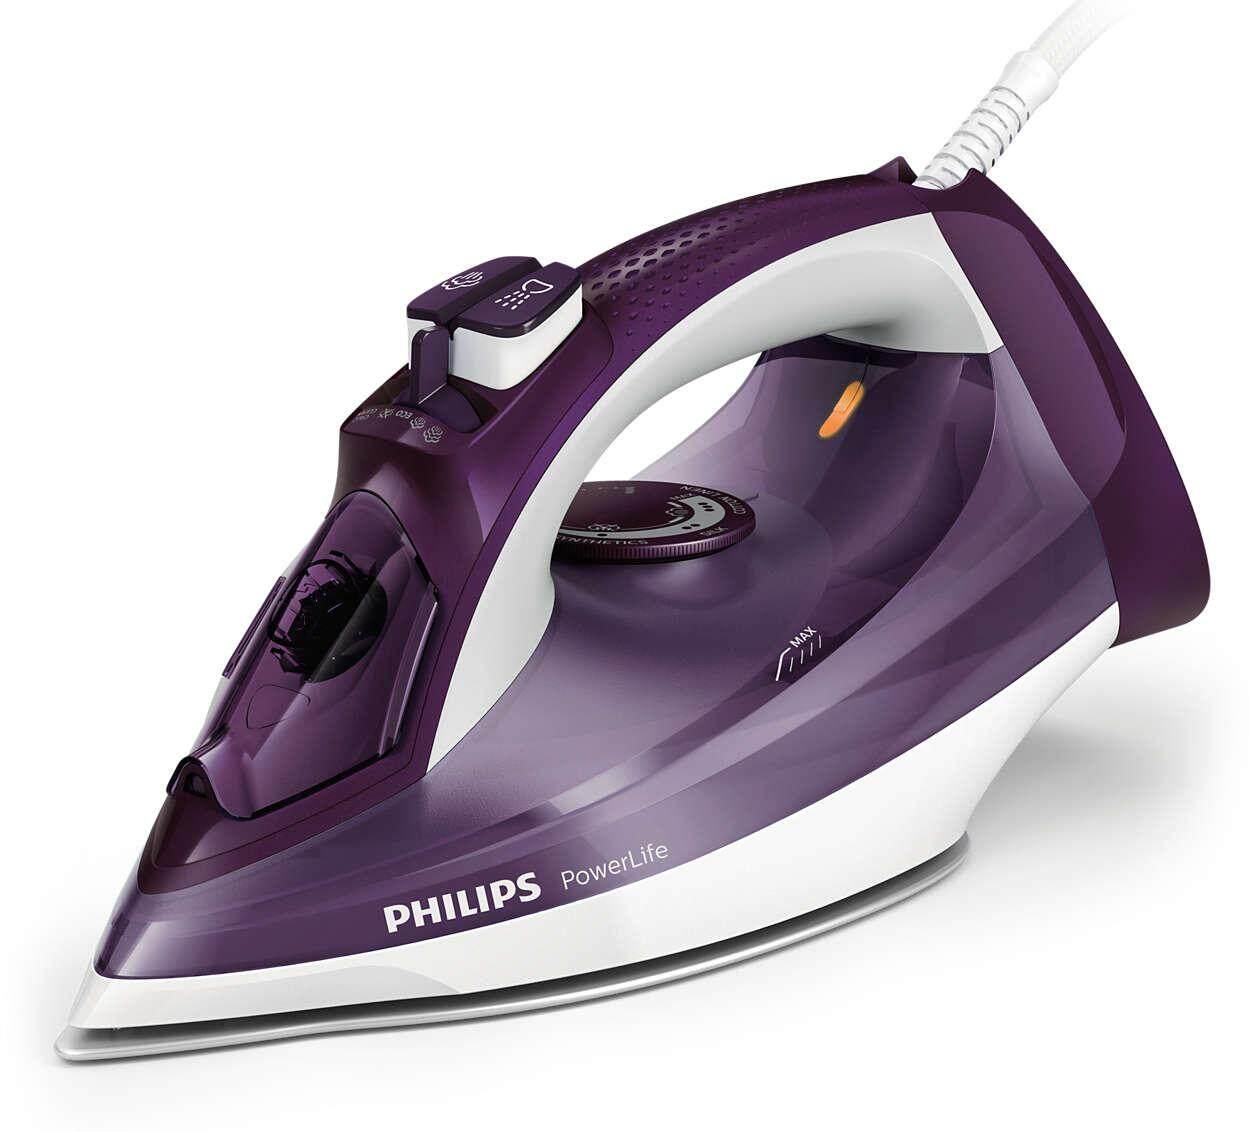 Philips PowerLife เตารีดไอน้ำ GC2995/30